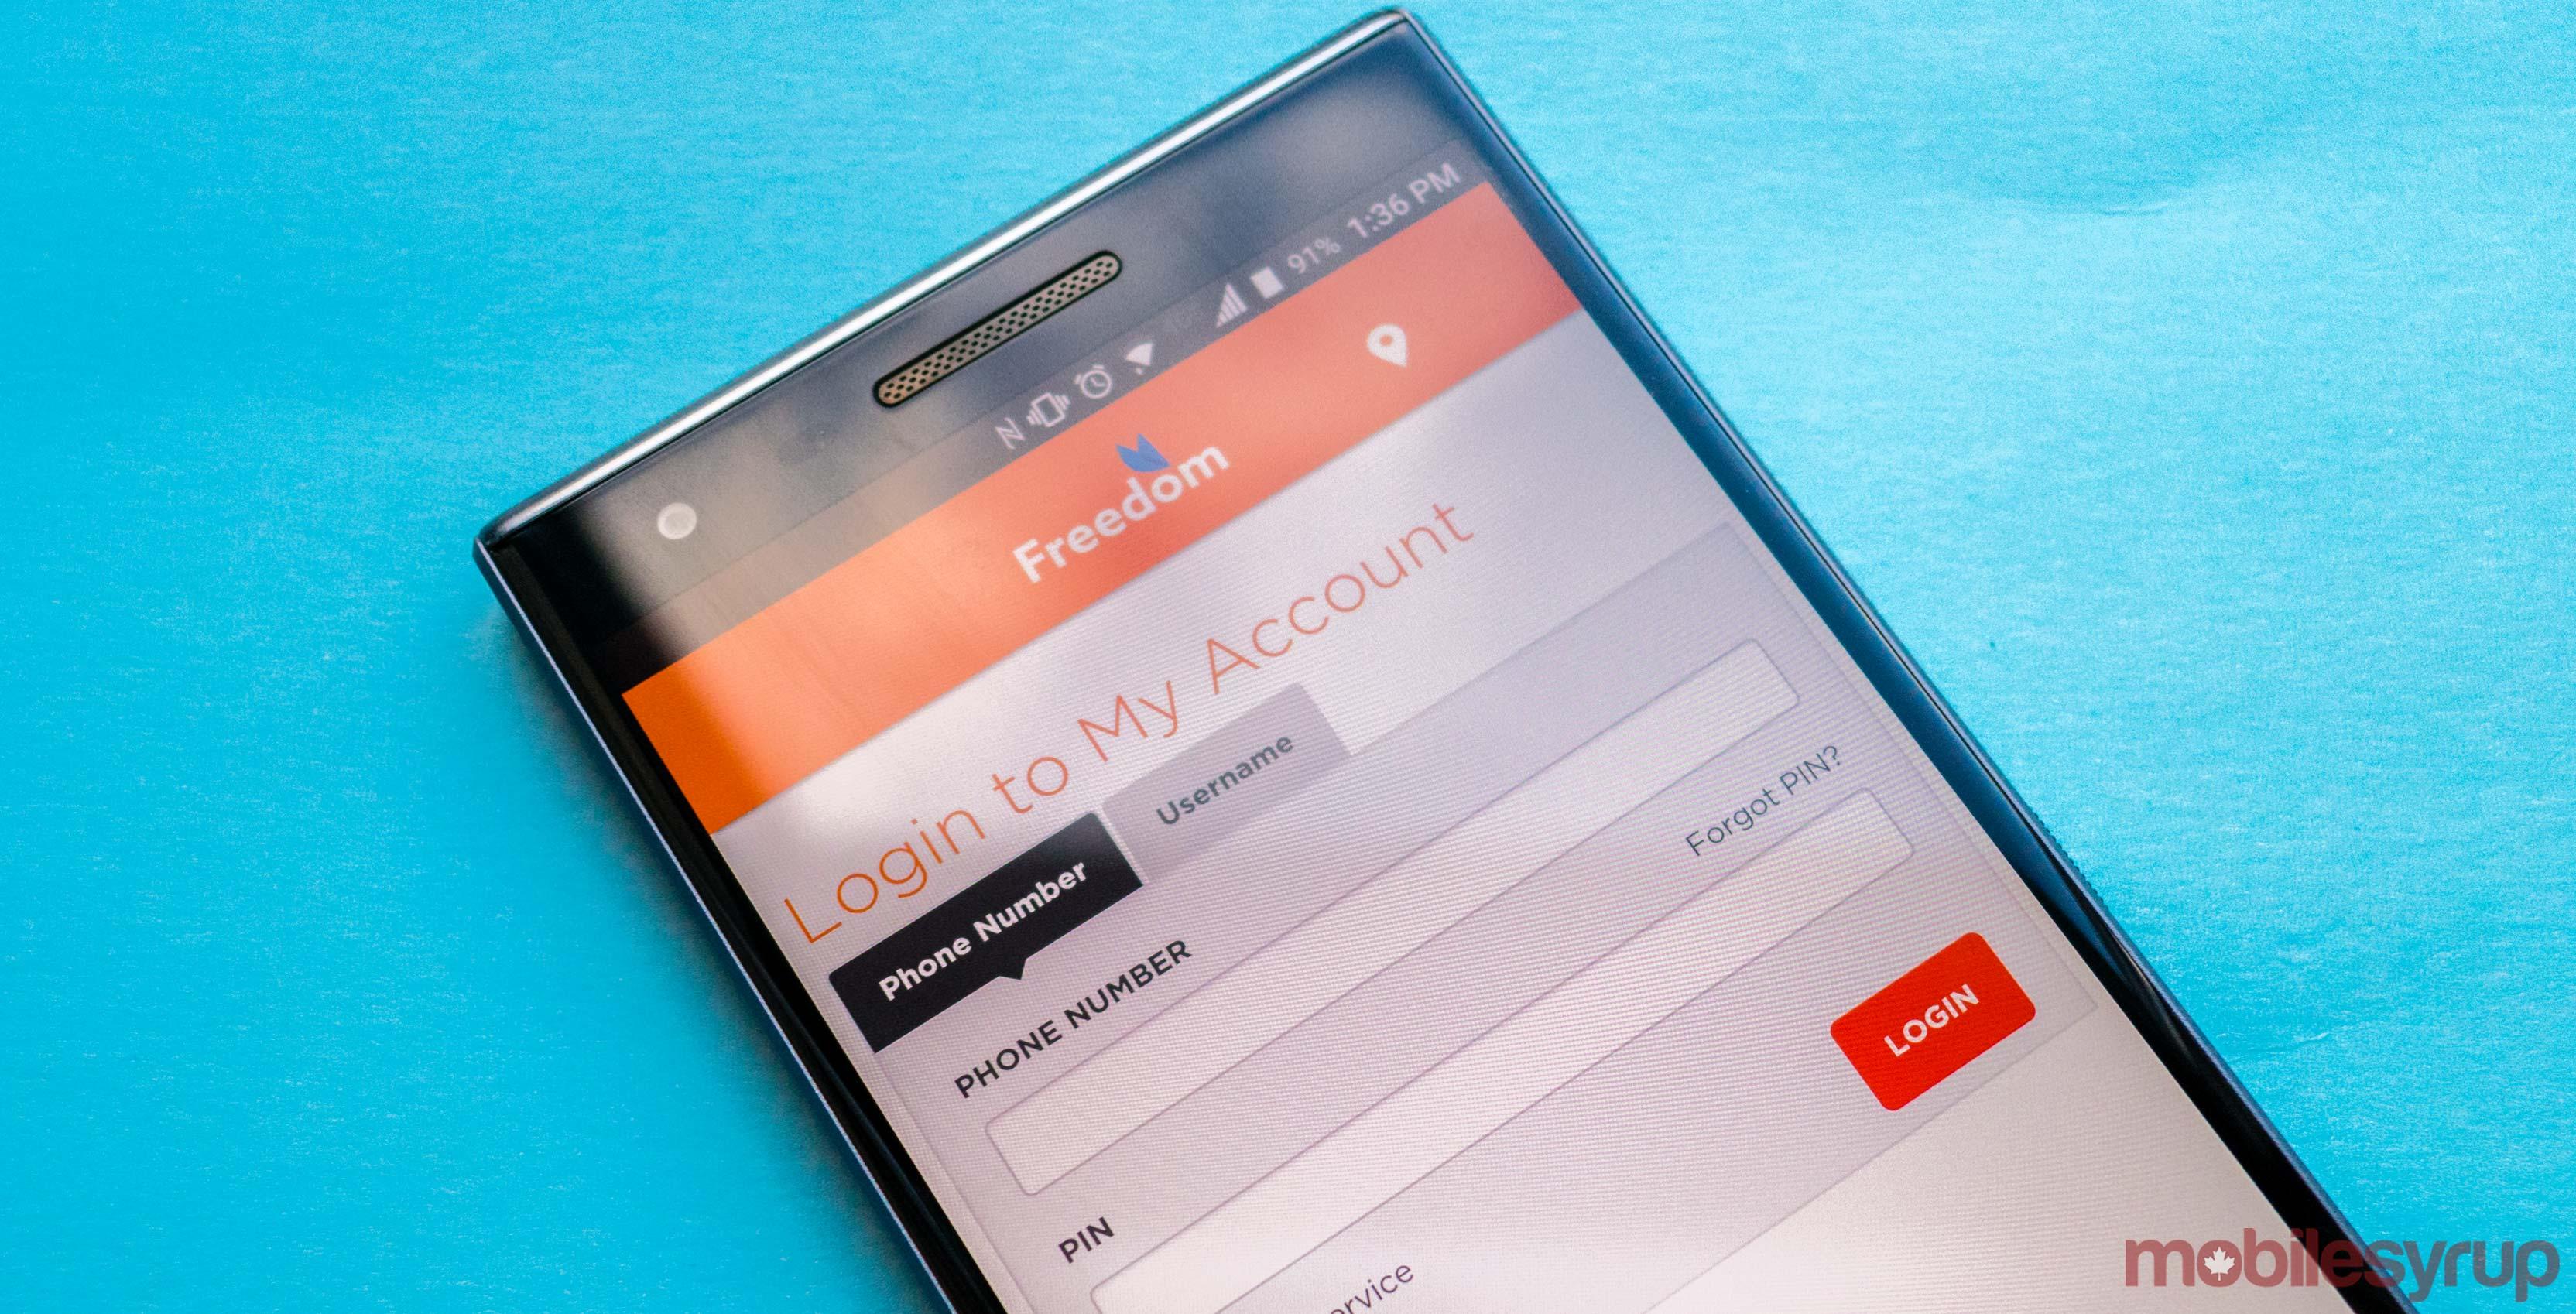 Freedom Mobile's My Account app